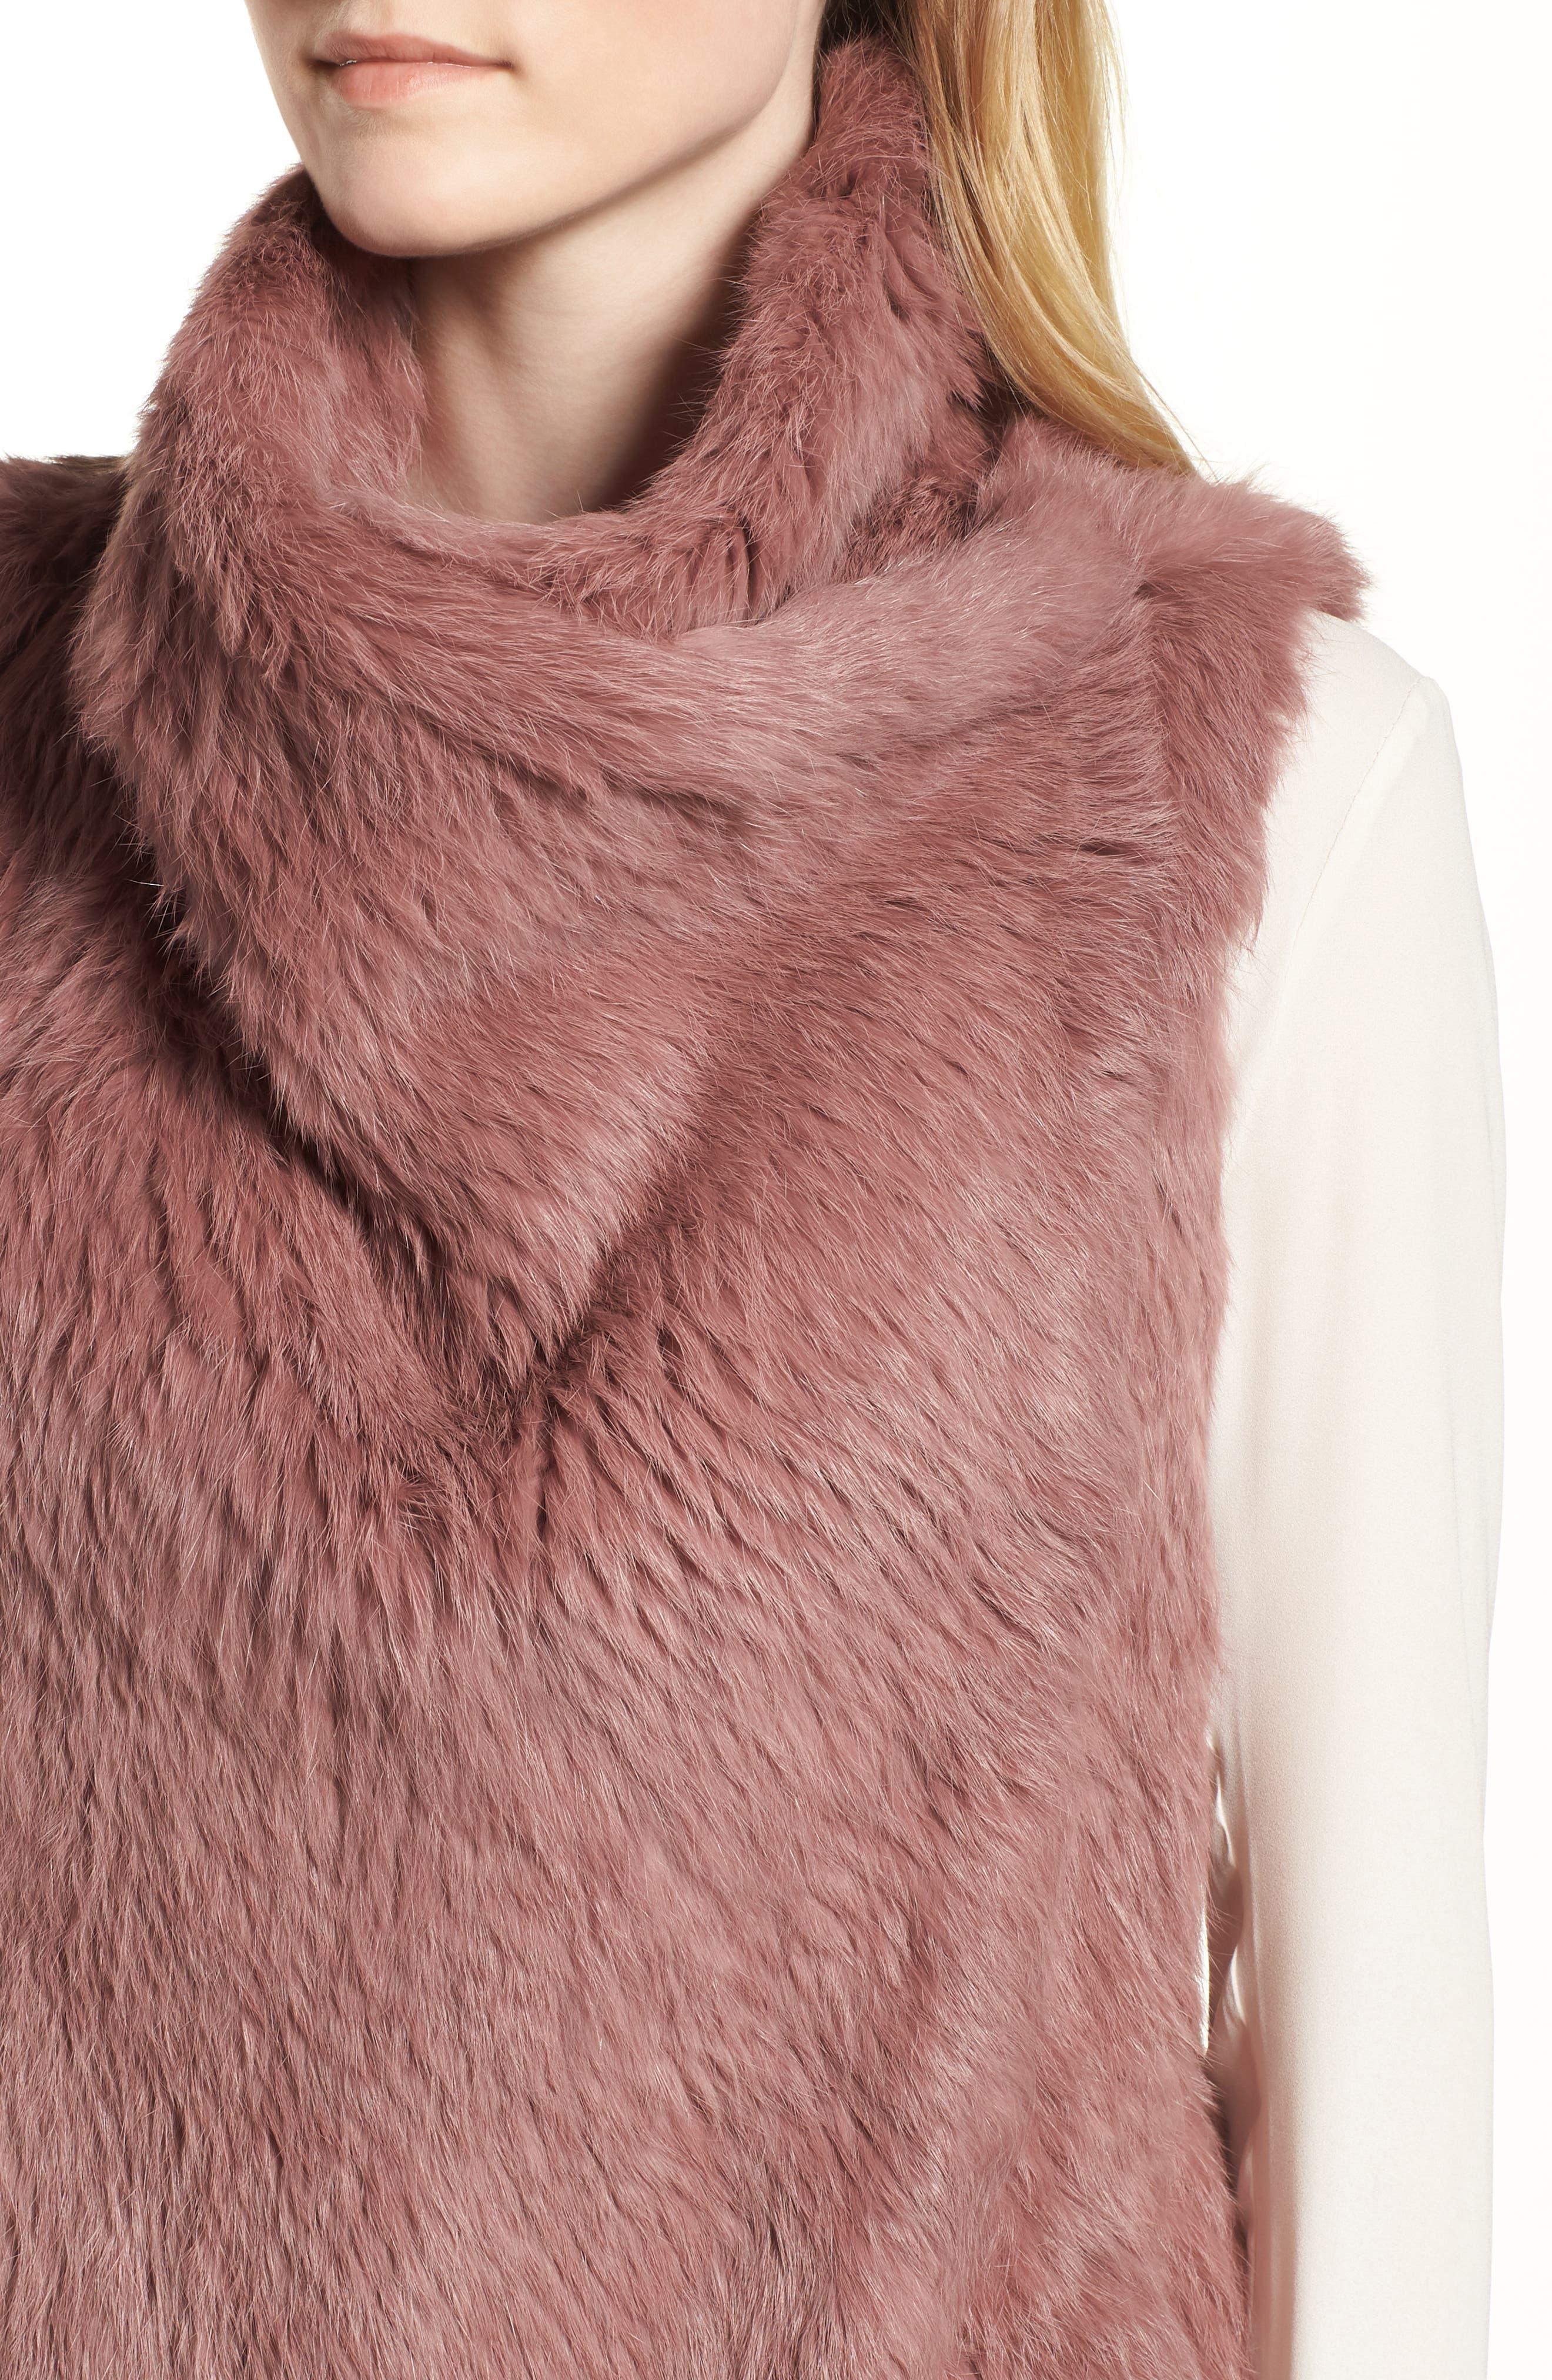 Long Drape Genuine Rabbit Fur Vest,                             Alternate thumbnail 4, color,                             Rose